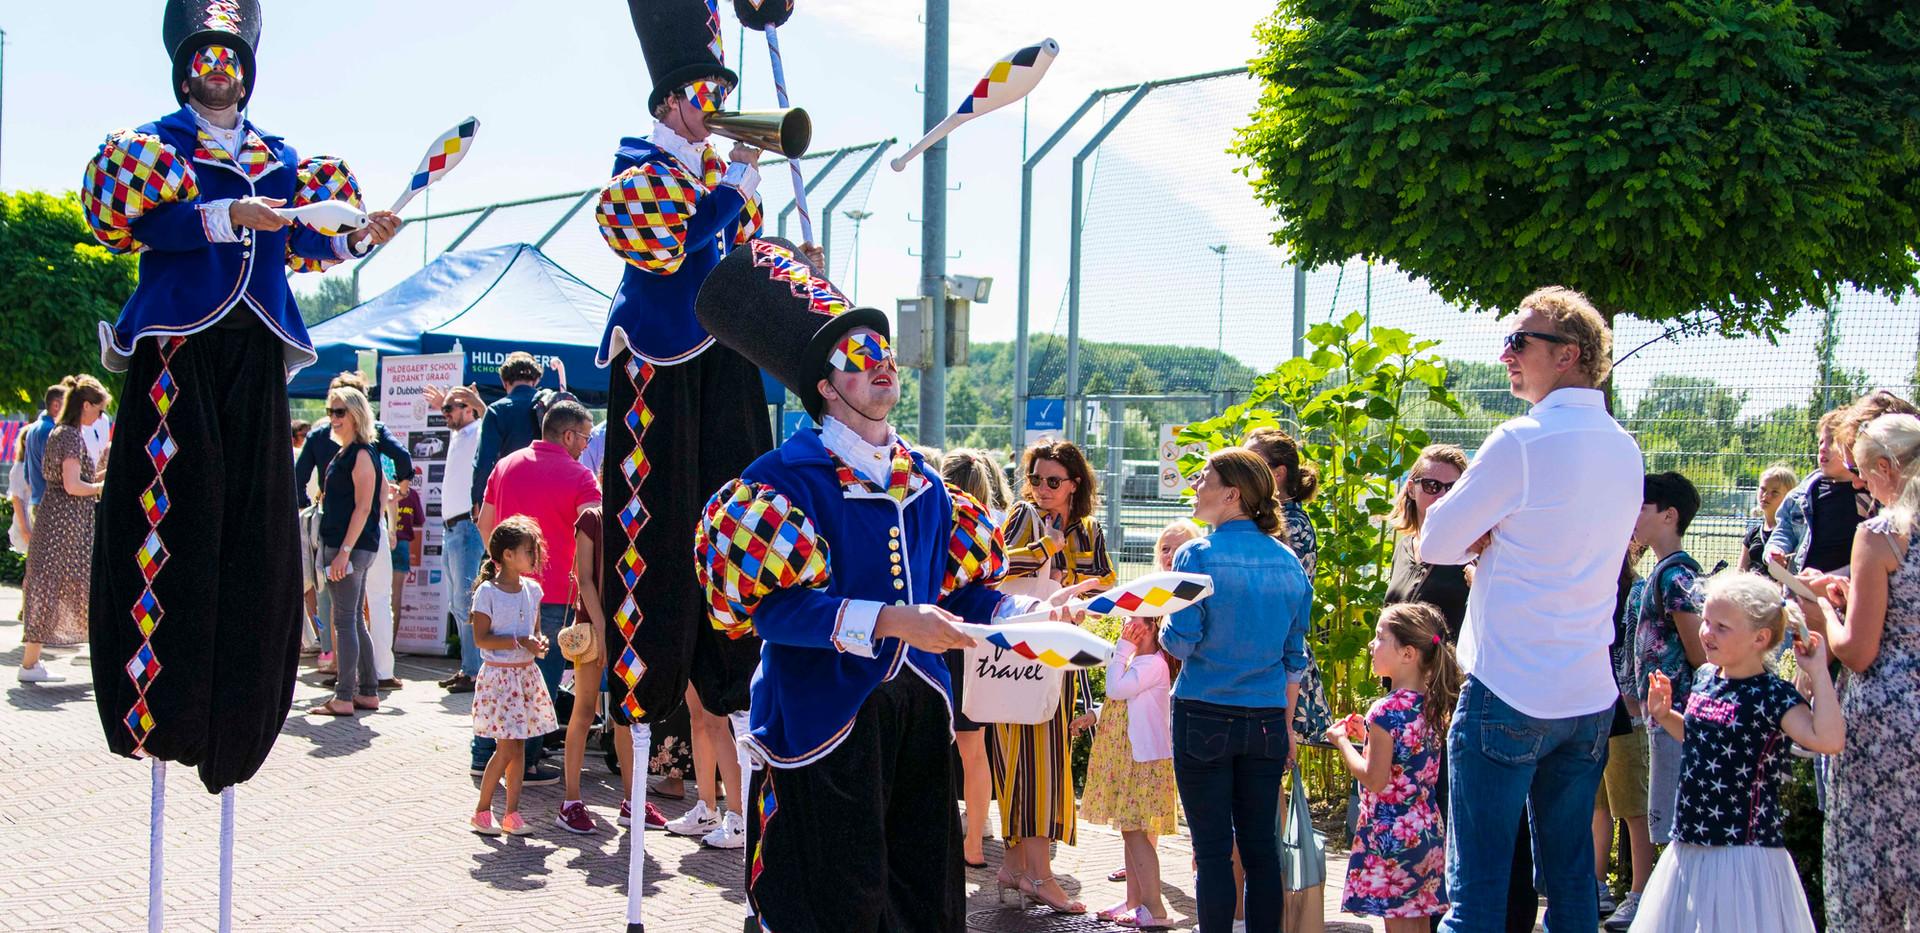 Cirque_Masque_steltenlopers_parade_optoc